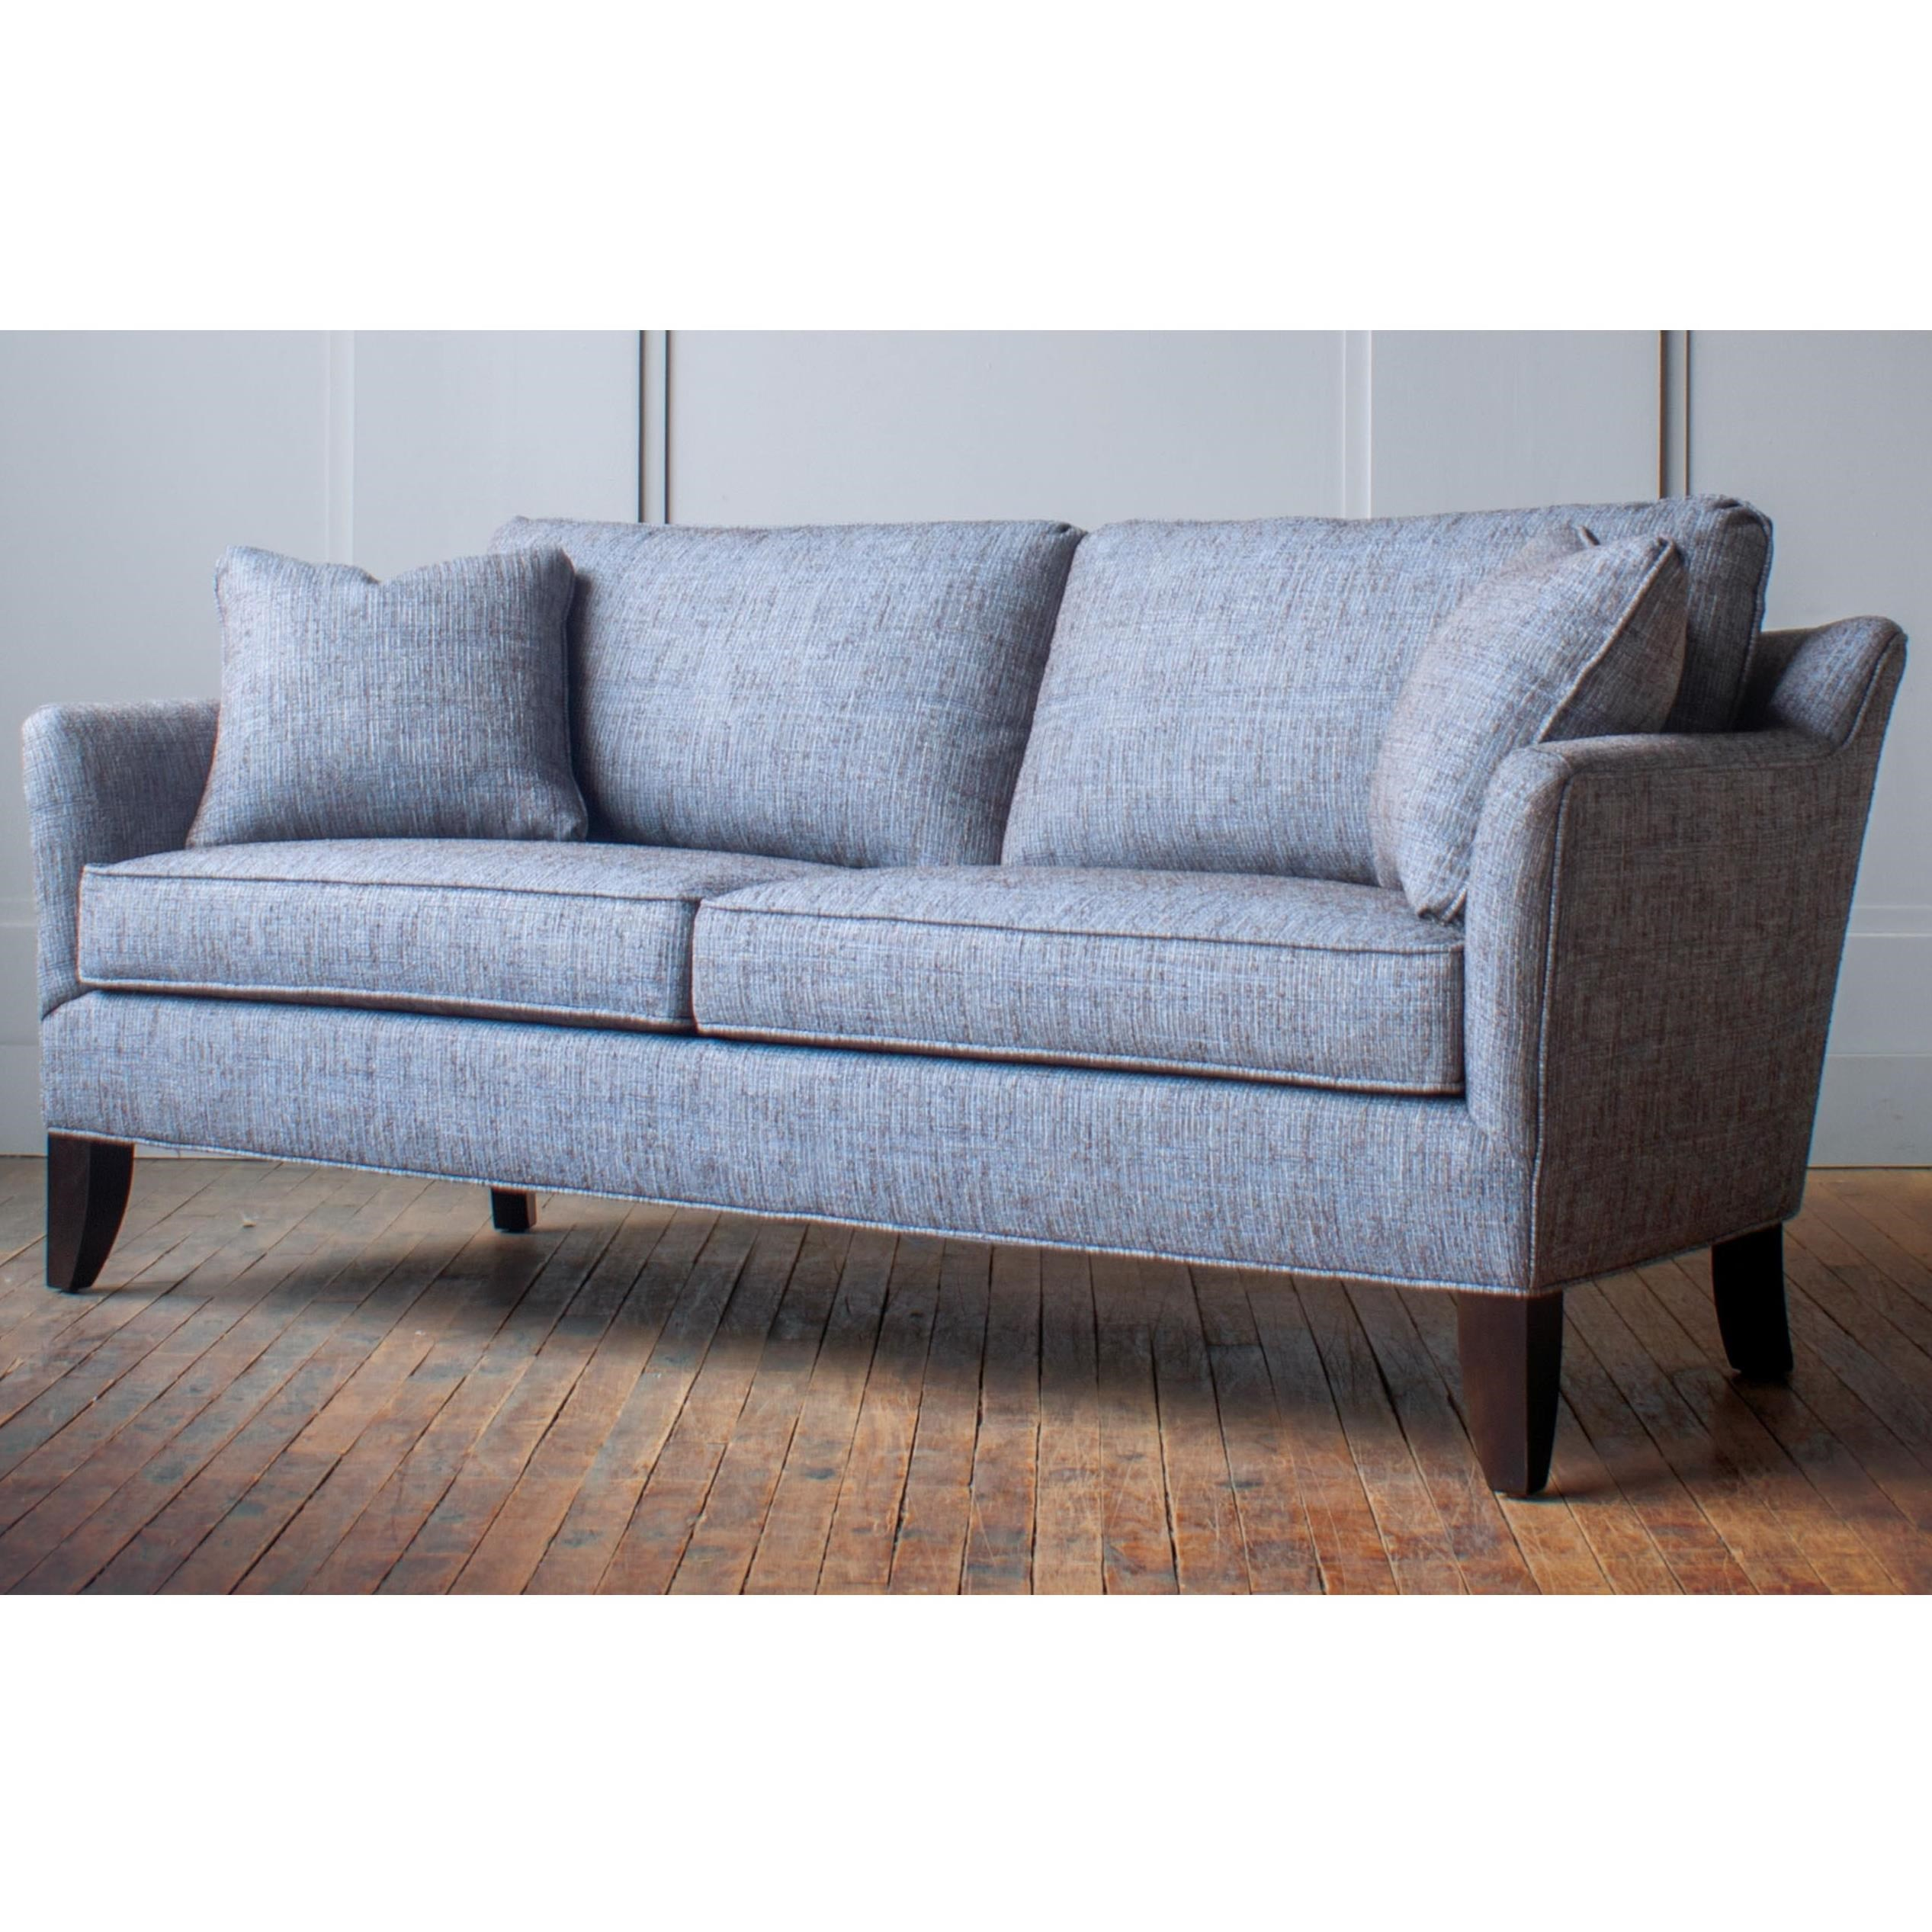 Cambridge Cusotmizable Condo Sofa at Bennett's Furniture and Mattresses